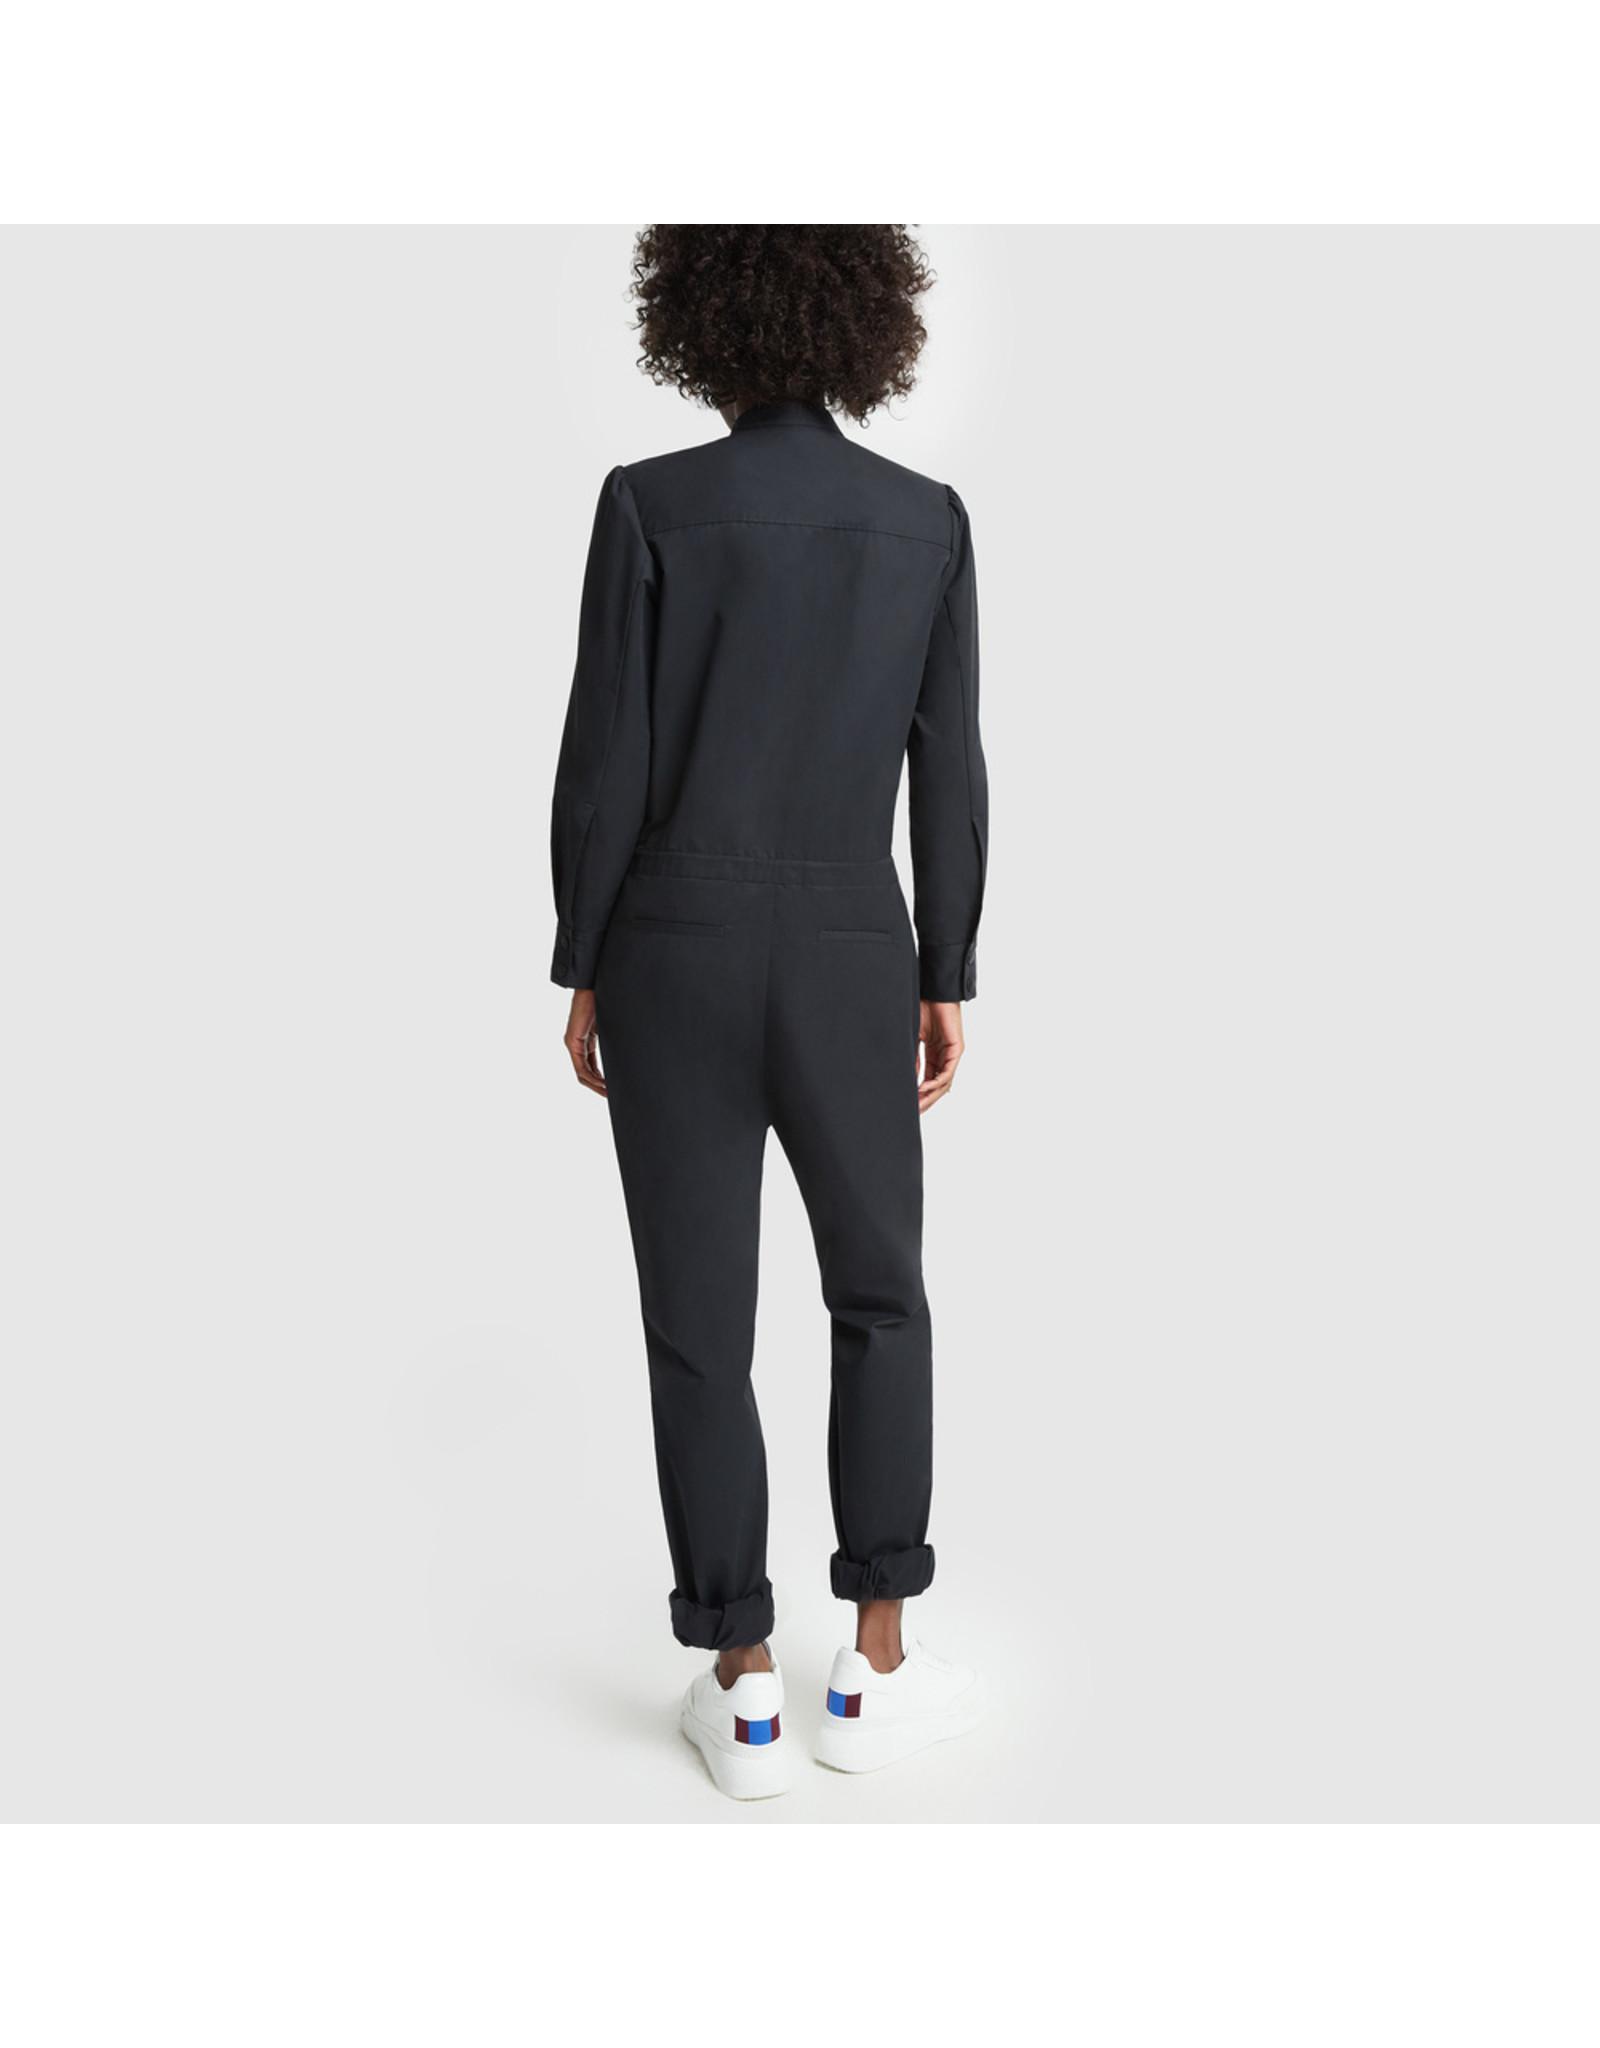 G. Label G. Label Terry Slim Jumpsuit (Size: 0, Color: Navy)